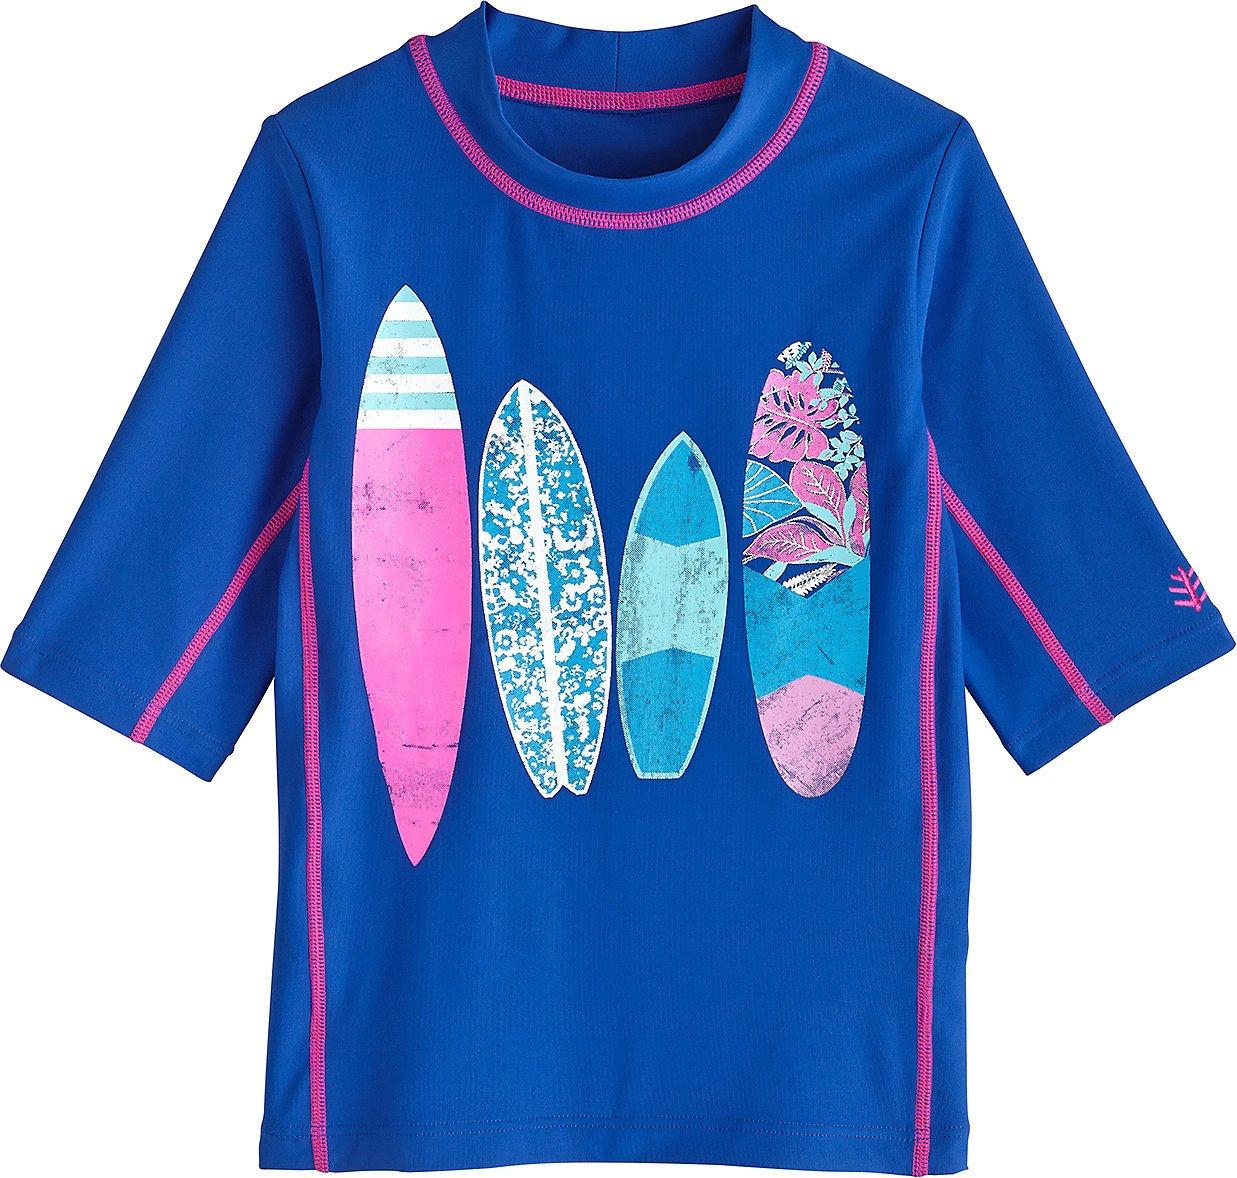 Coolibar UPF 50+ Kids' Surf Shirt - Sun Protective (Medium- Baja Surfboards)